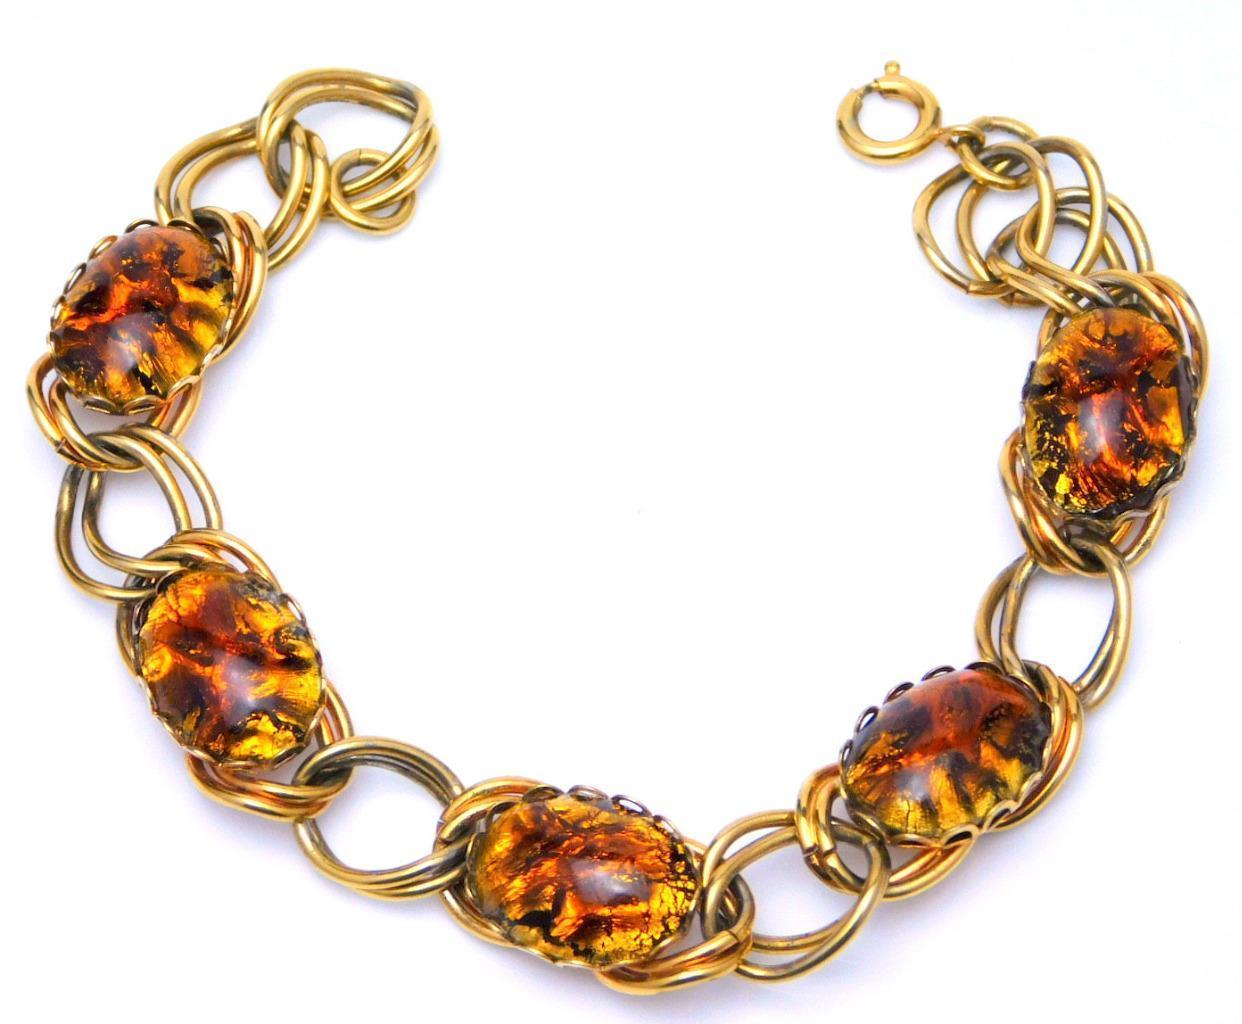 Vintage Gold Chain Link Bracelet w/Black And Gold Bezel Set Confetti Cabochons